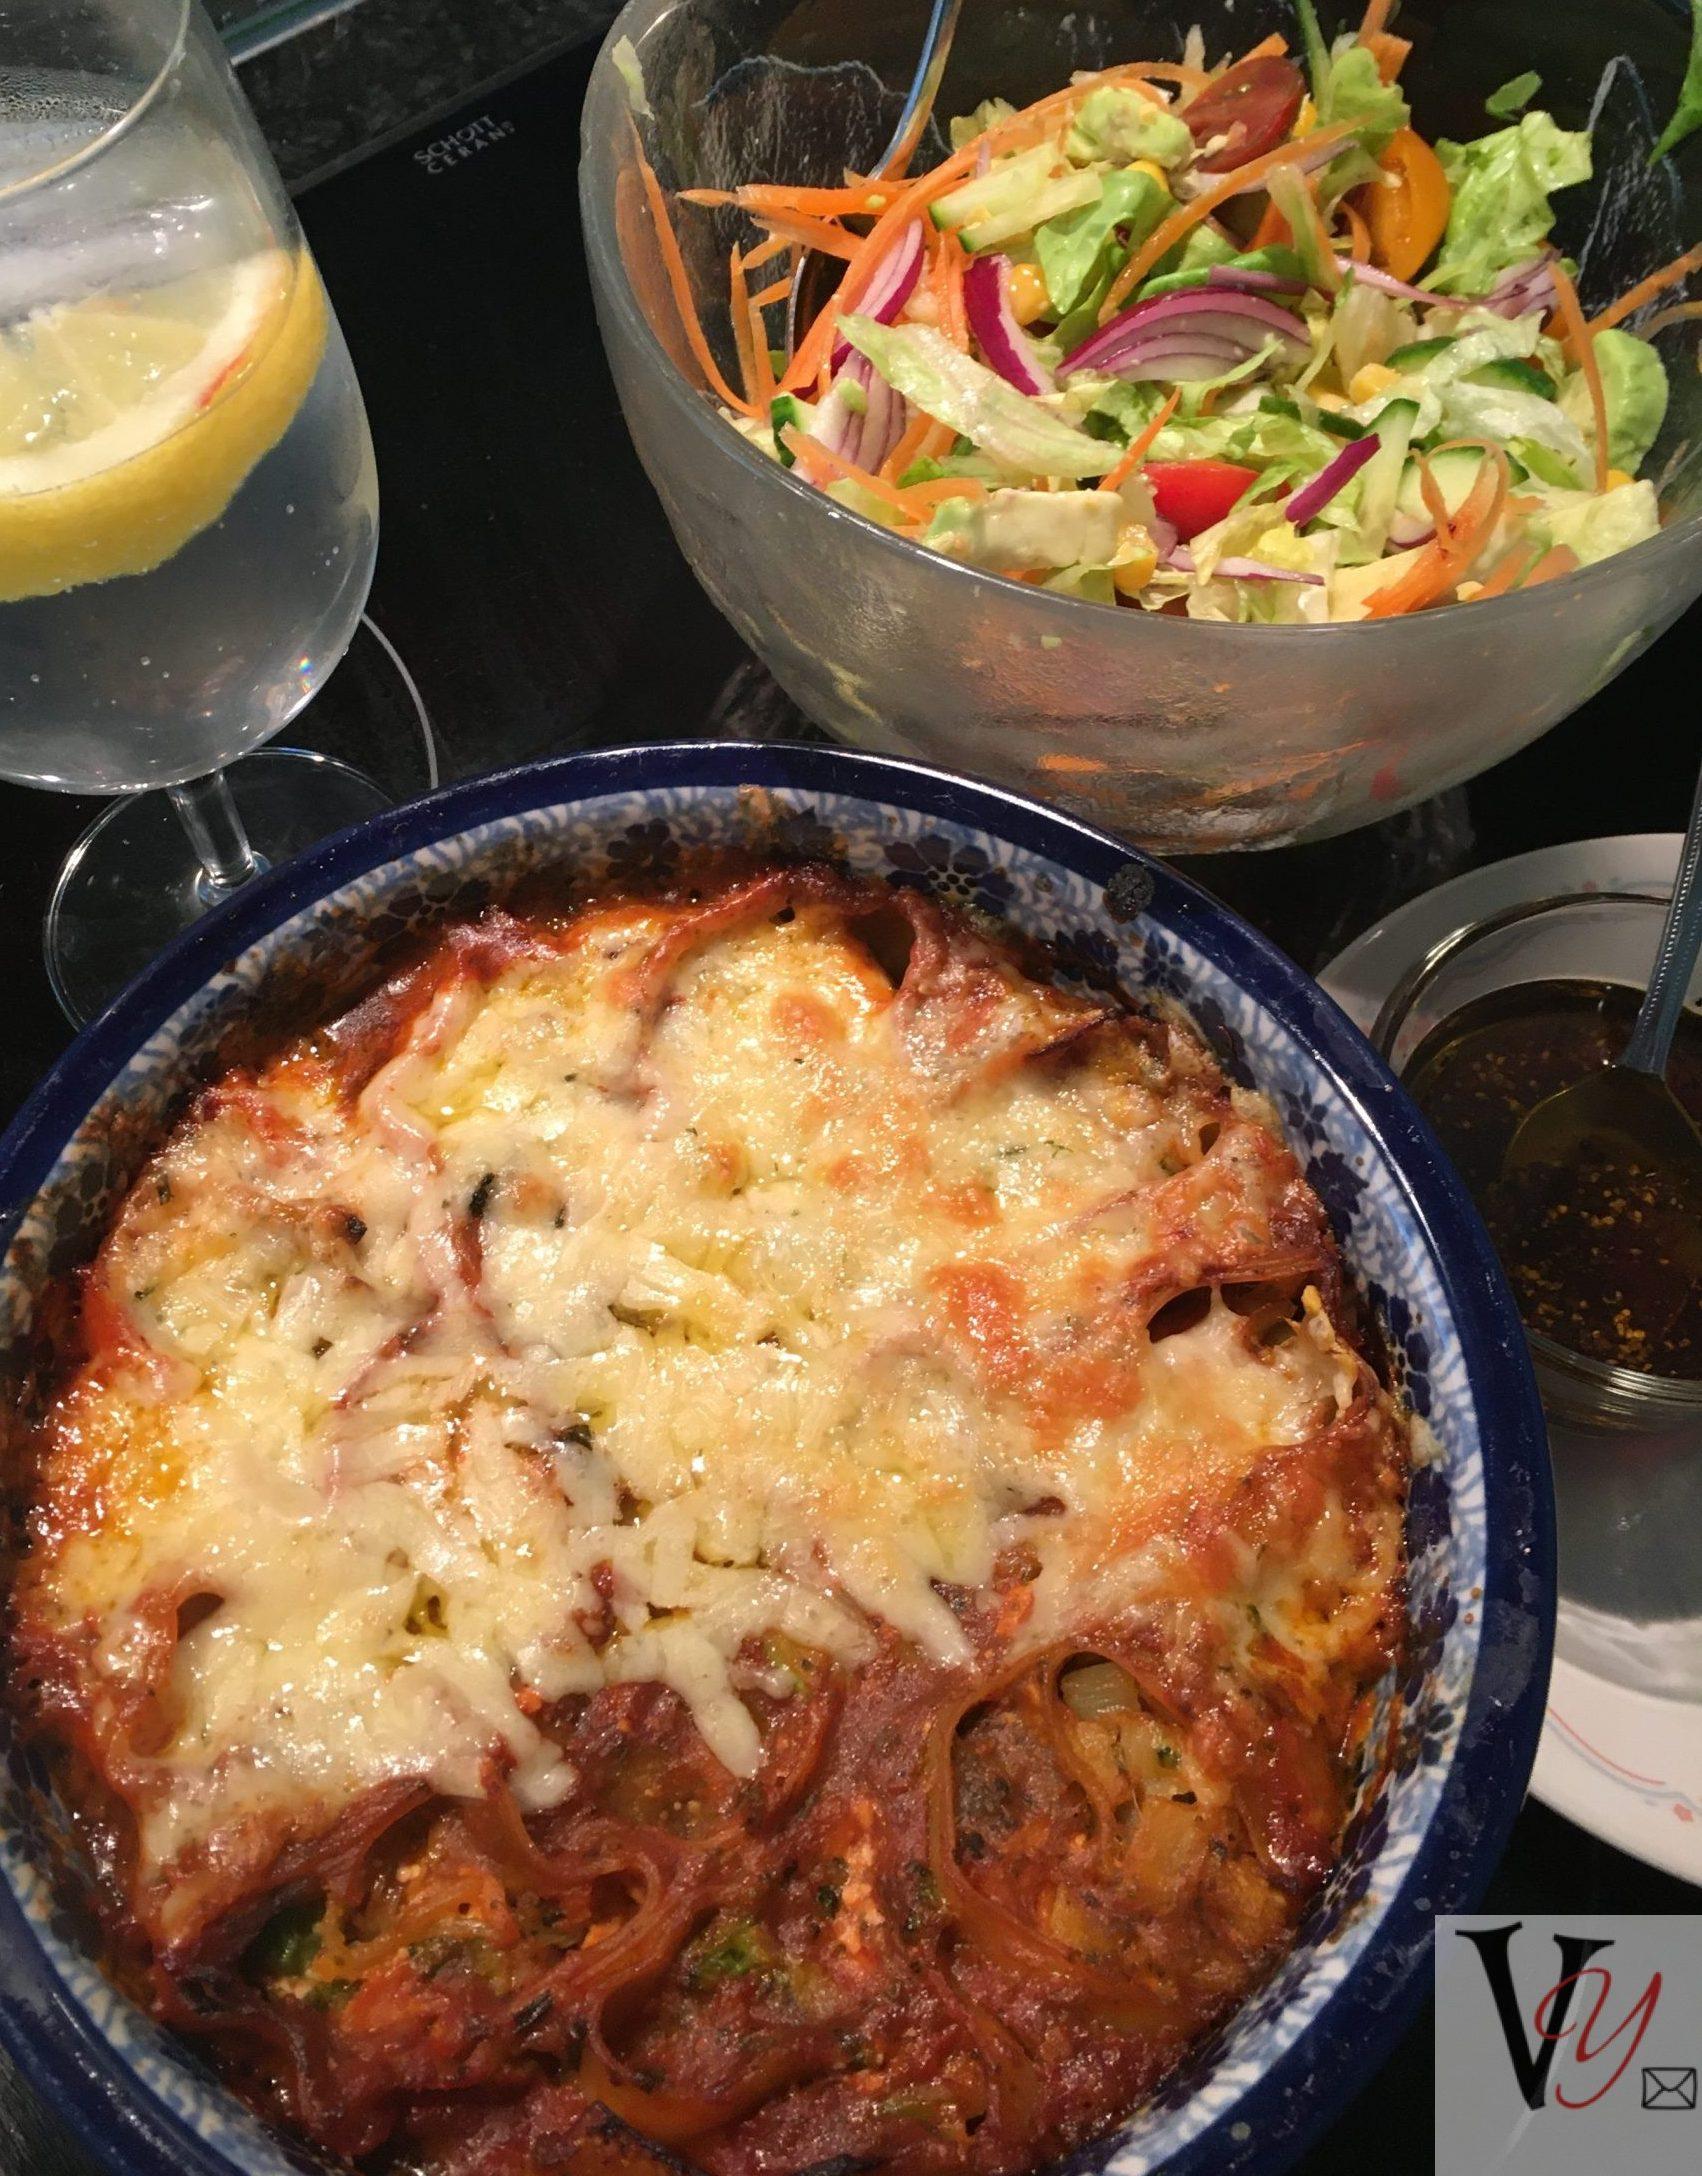 Rotolo and salad